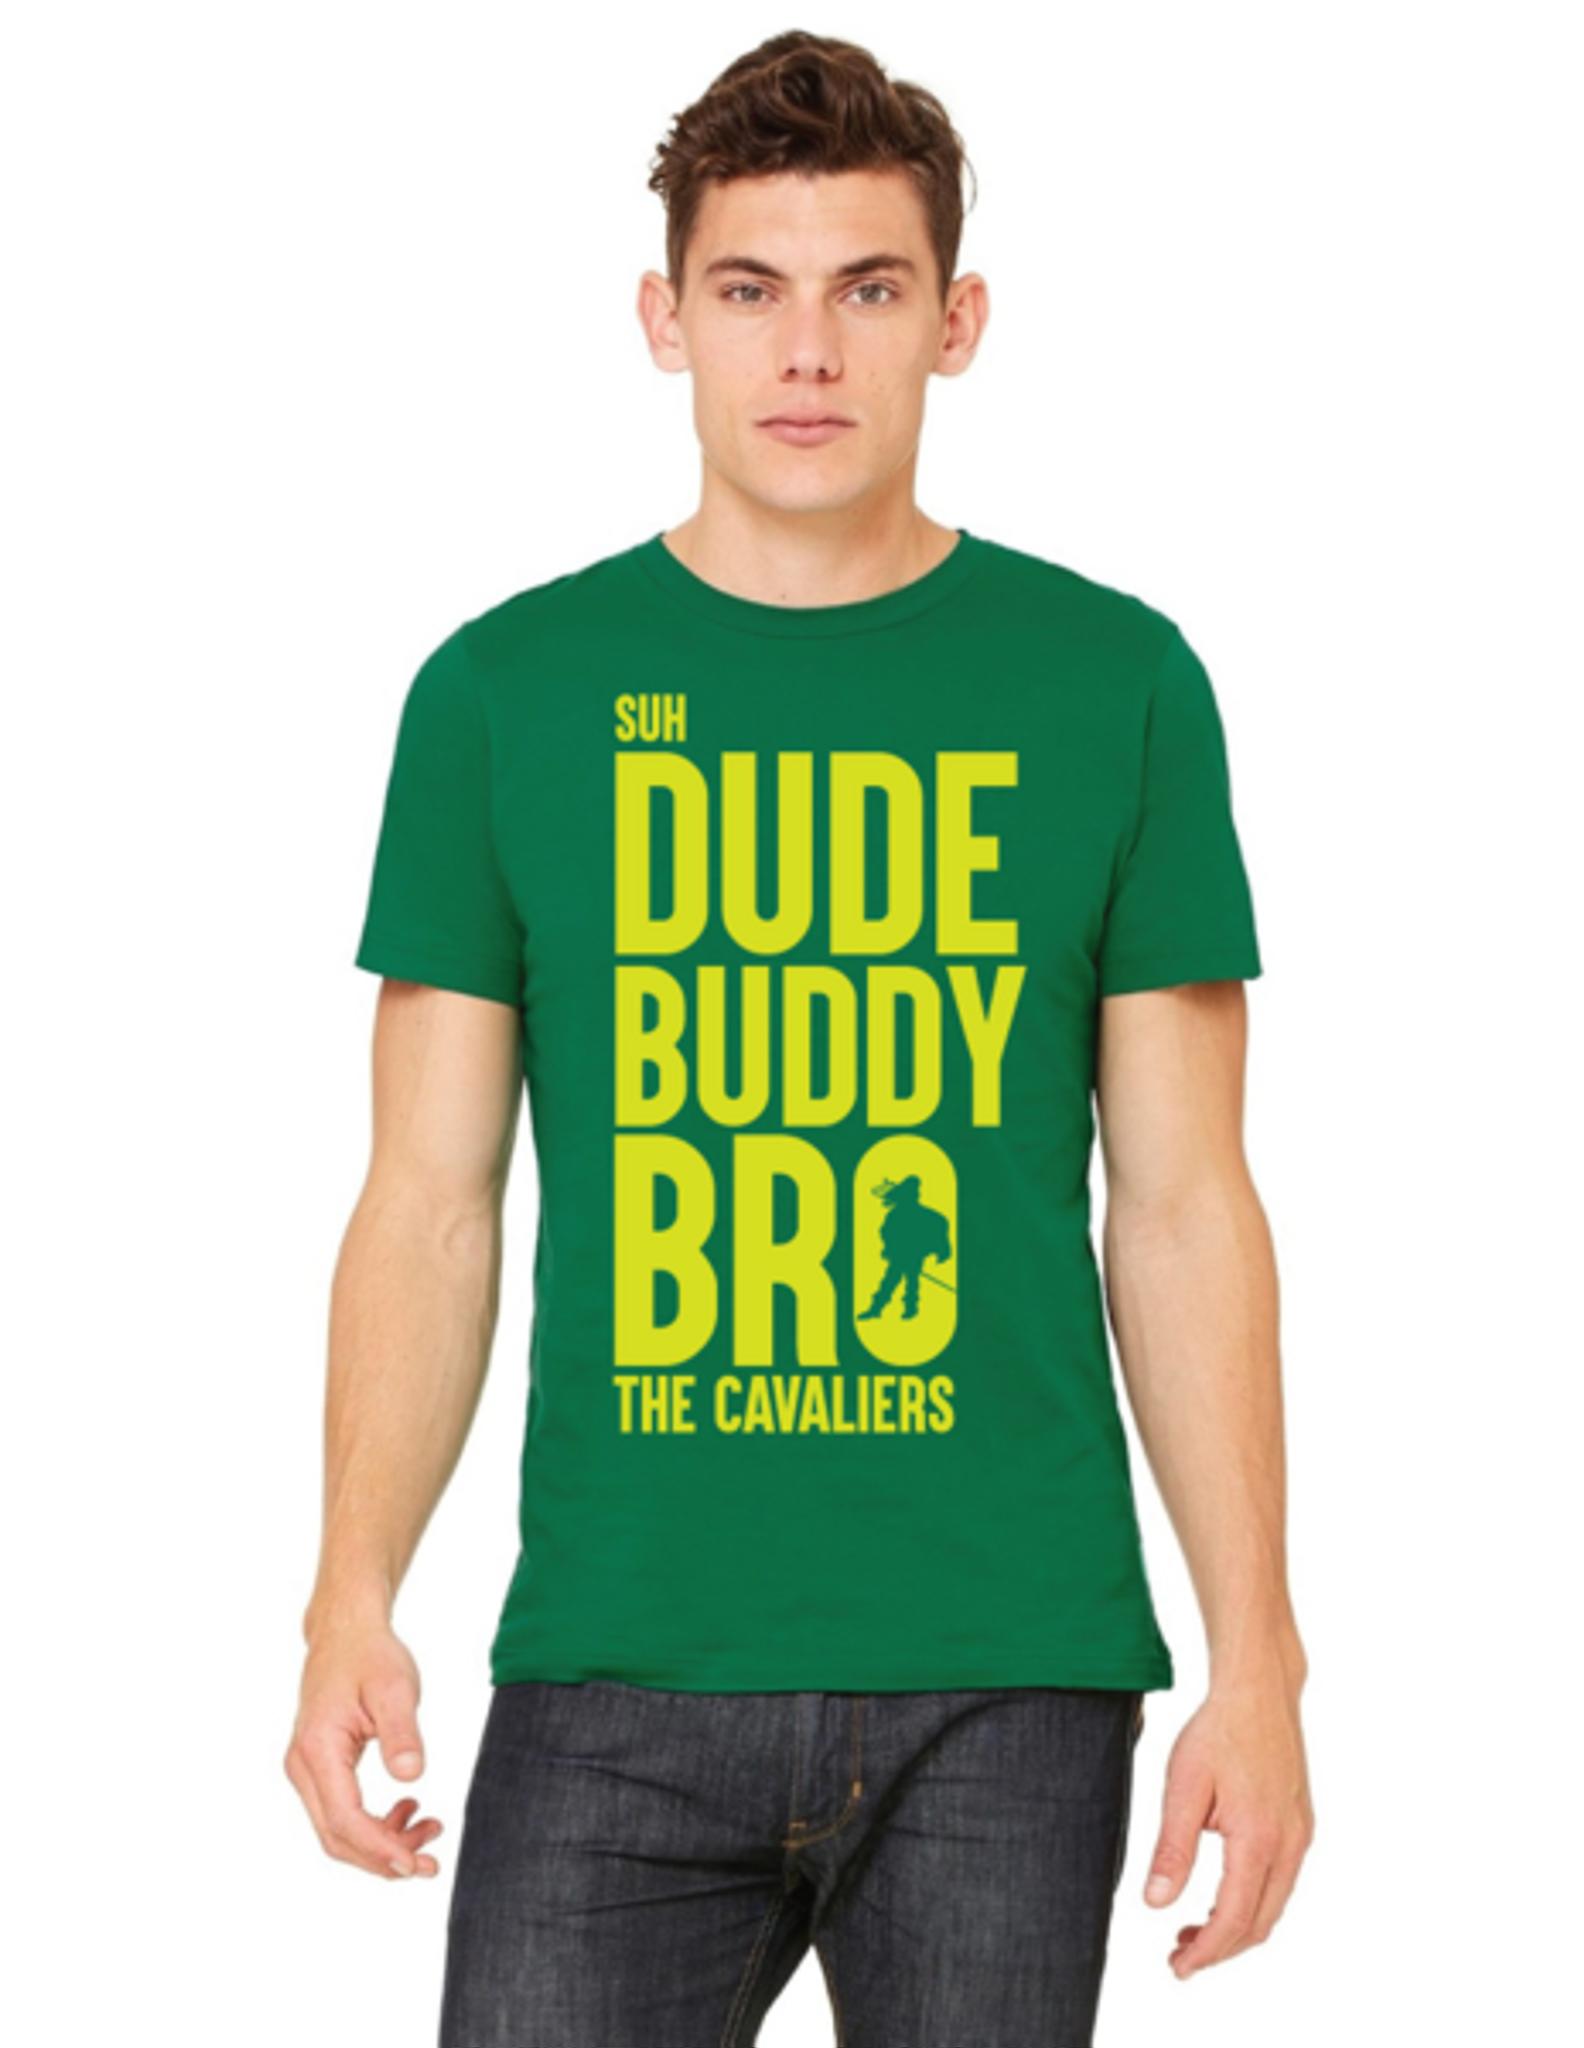 Cavaliers 2017 Dude, Buddy, Bro Show Shirt